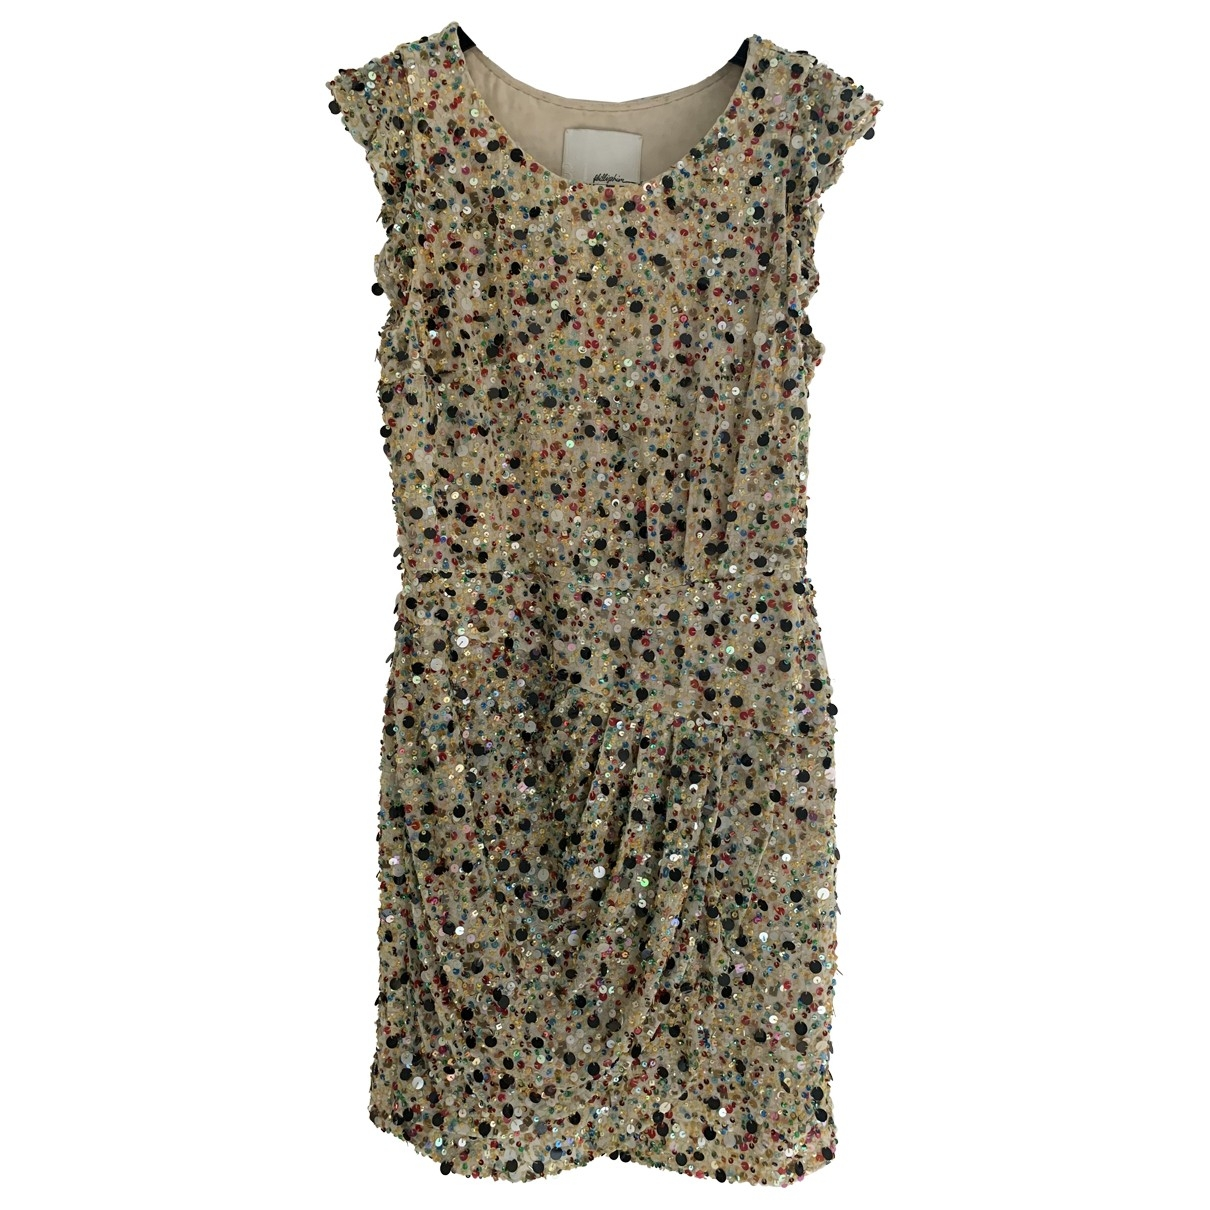 3.1 Phillip Lim \N Yellow Silk dress for Women 6 US